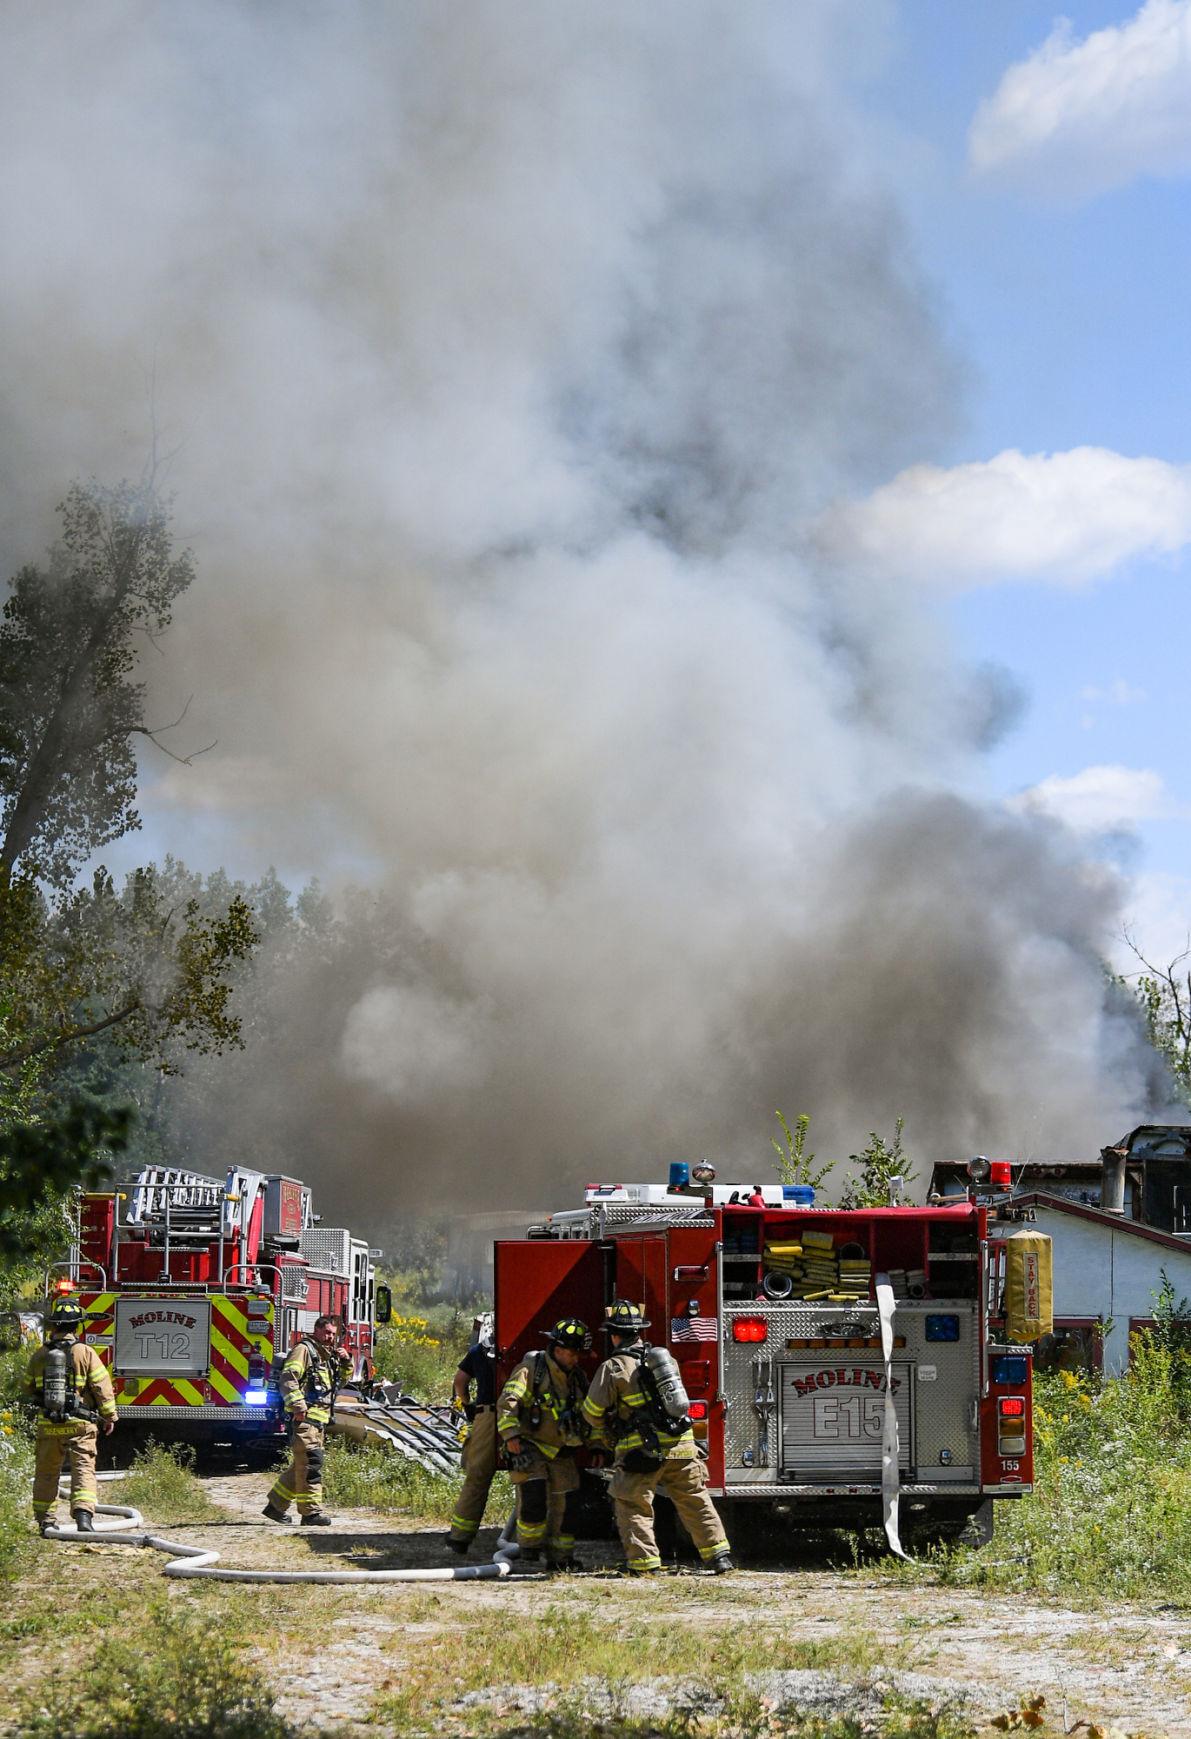 091521-qc-nws-fire-002